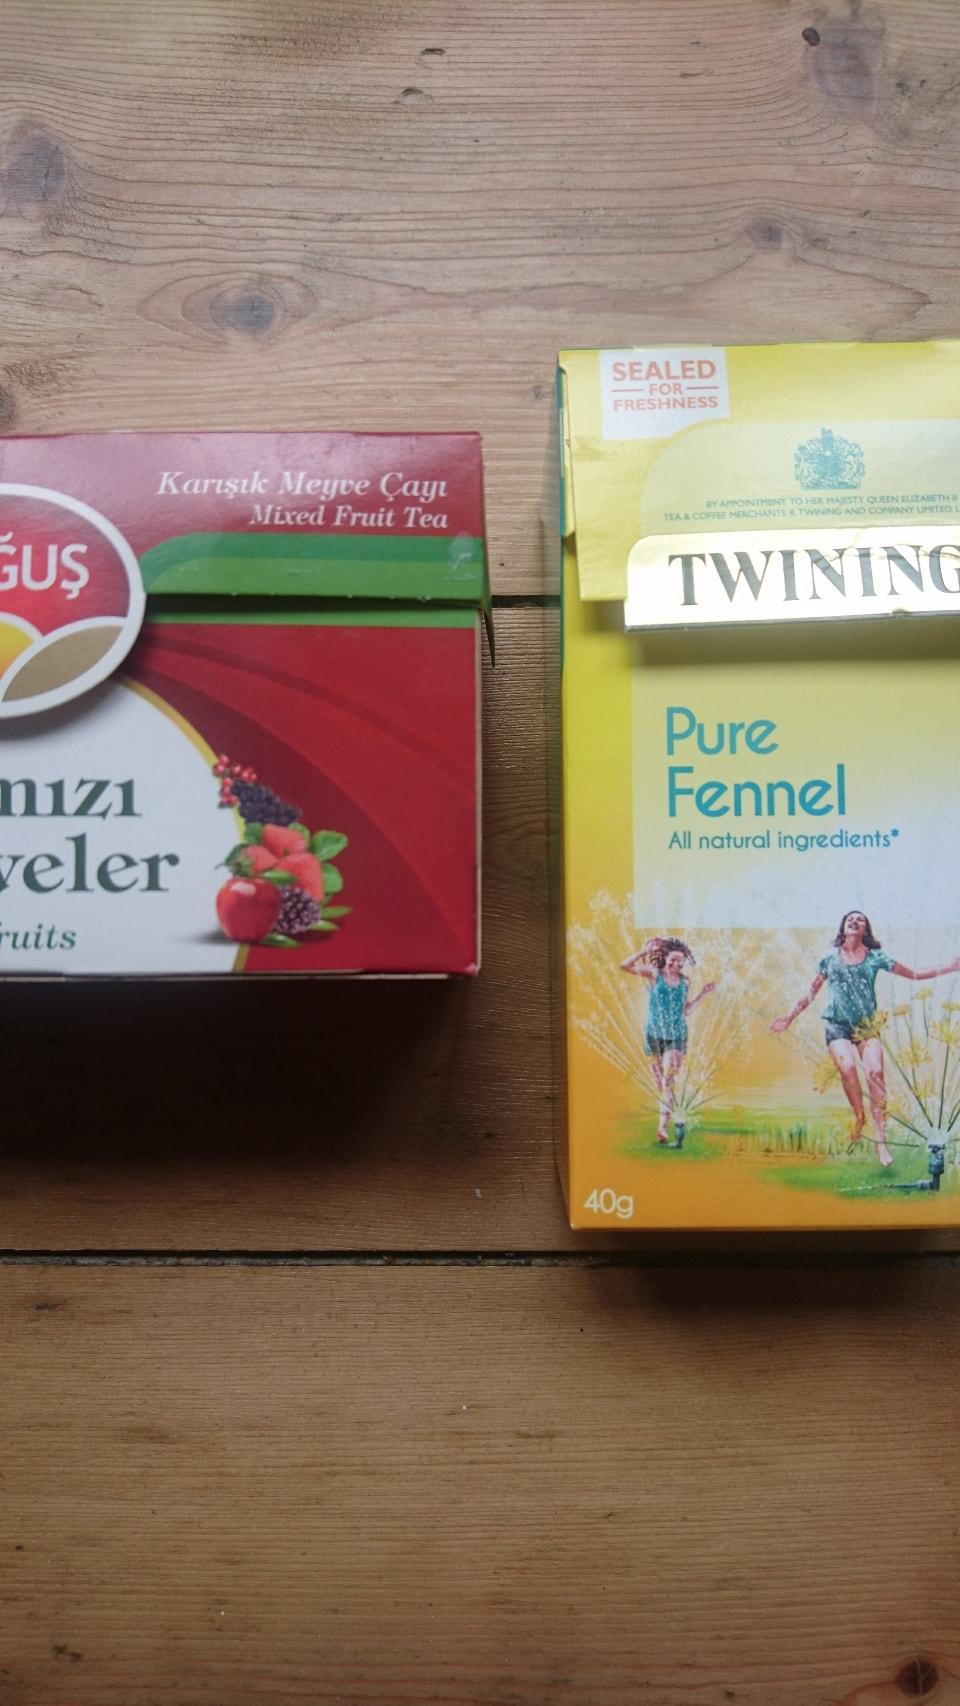 Mixed Fruit Tea + Twinings Fennel Tea